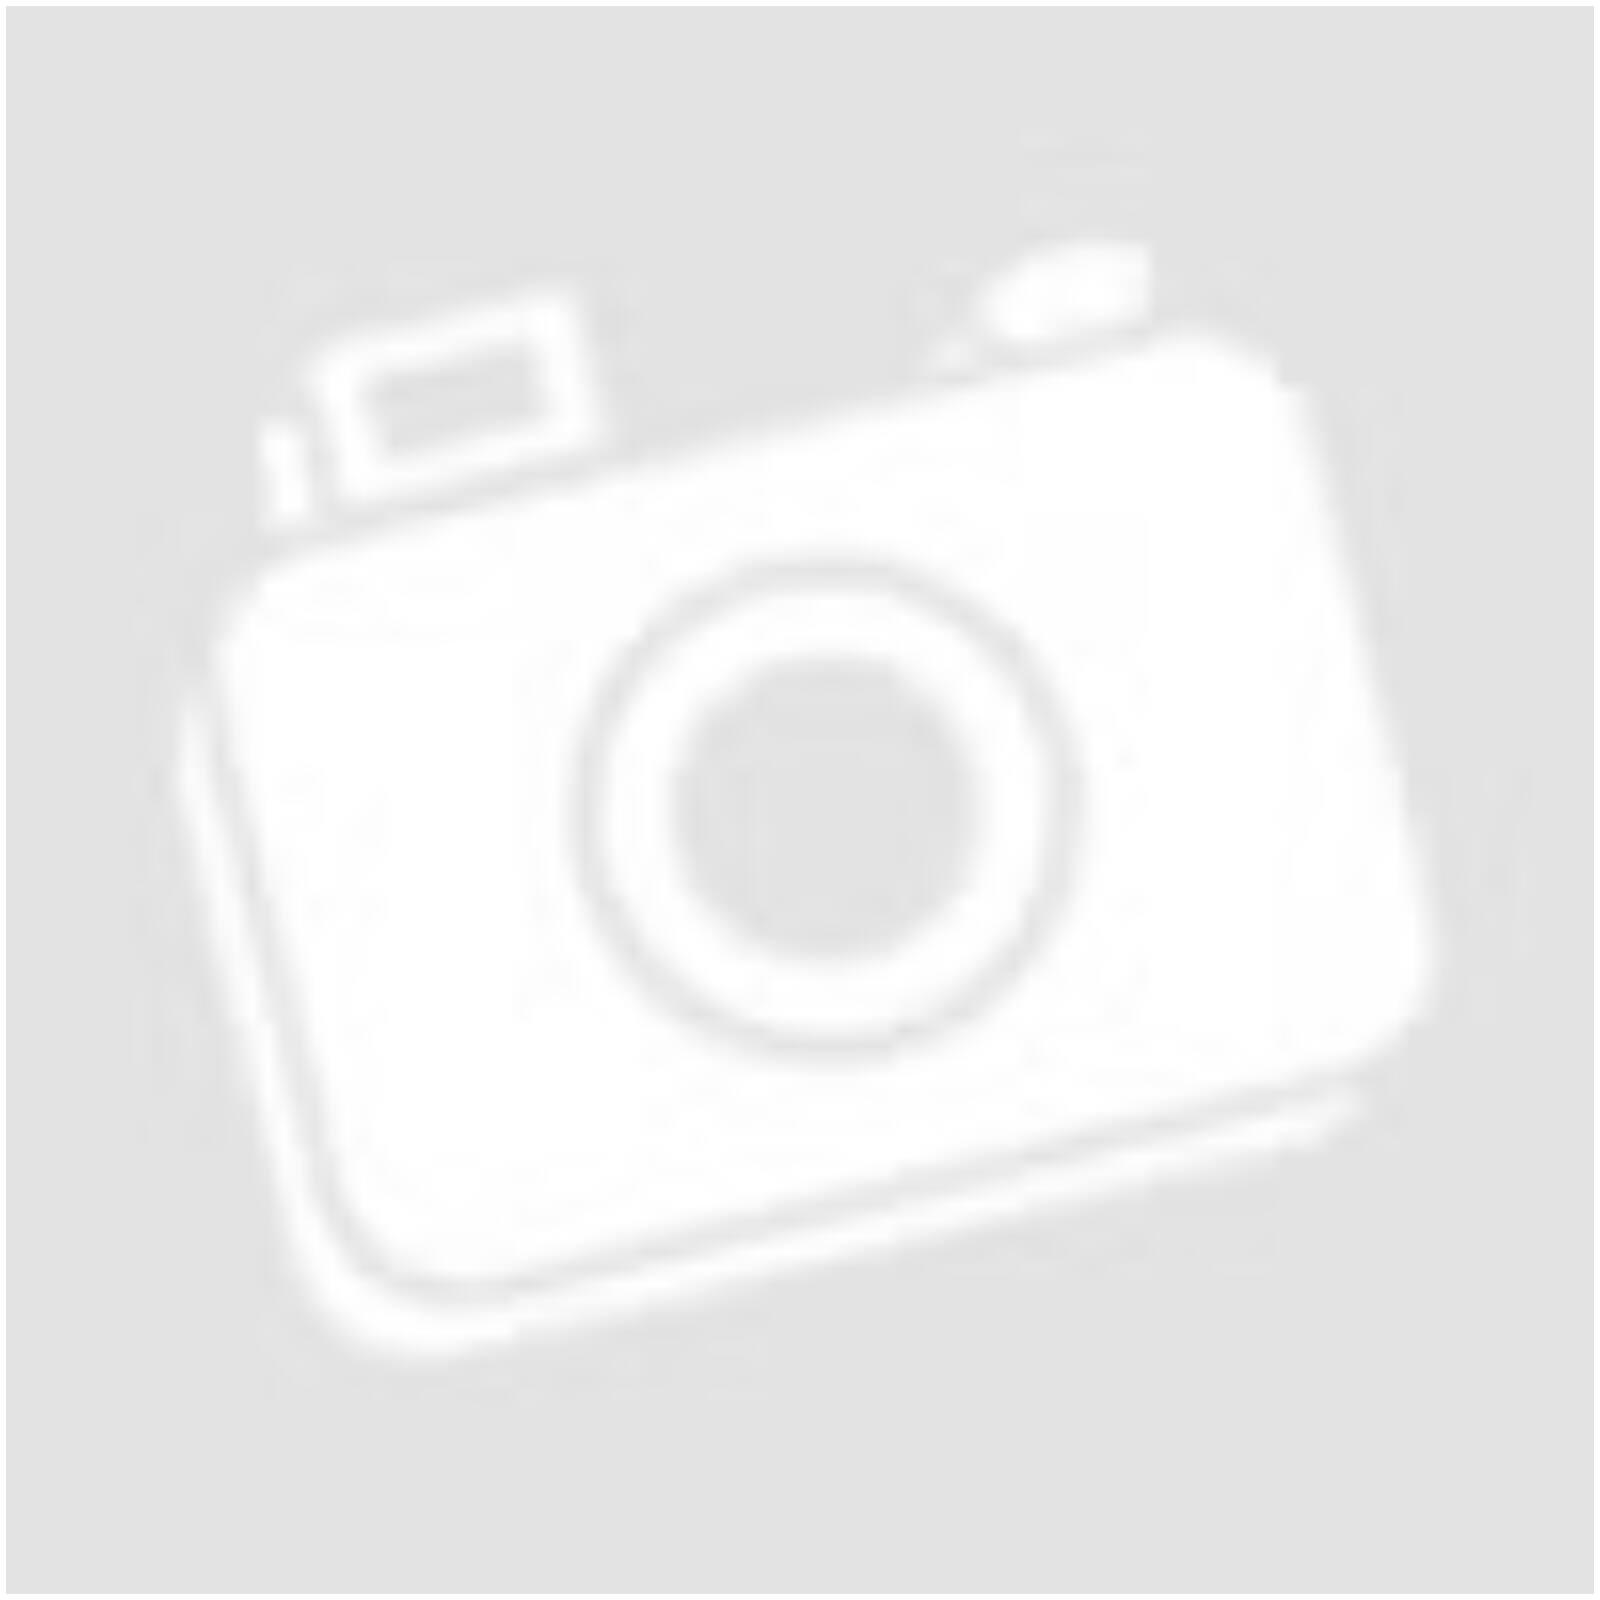 Szemceruza applikátorral barna 2g